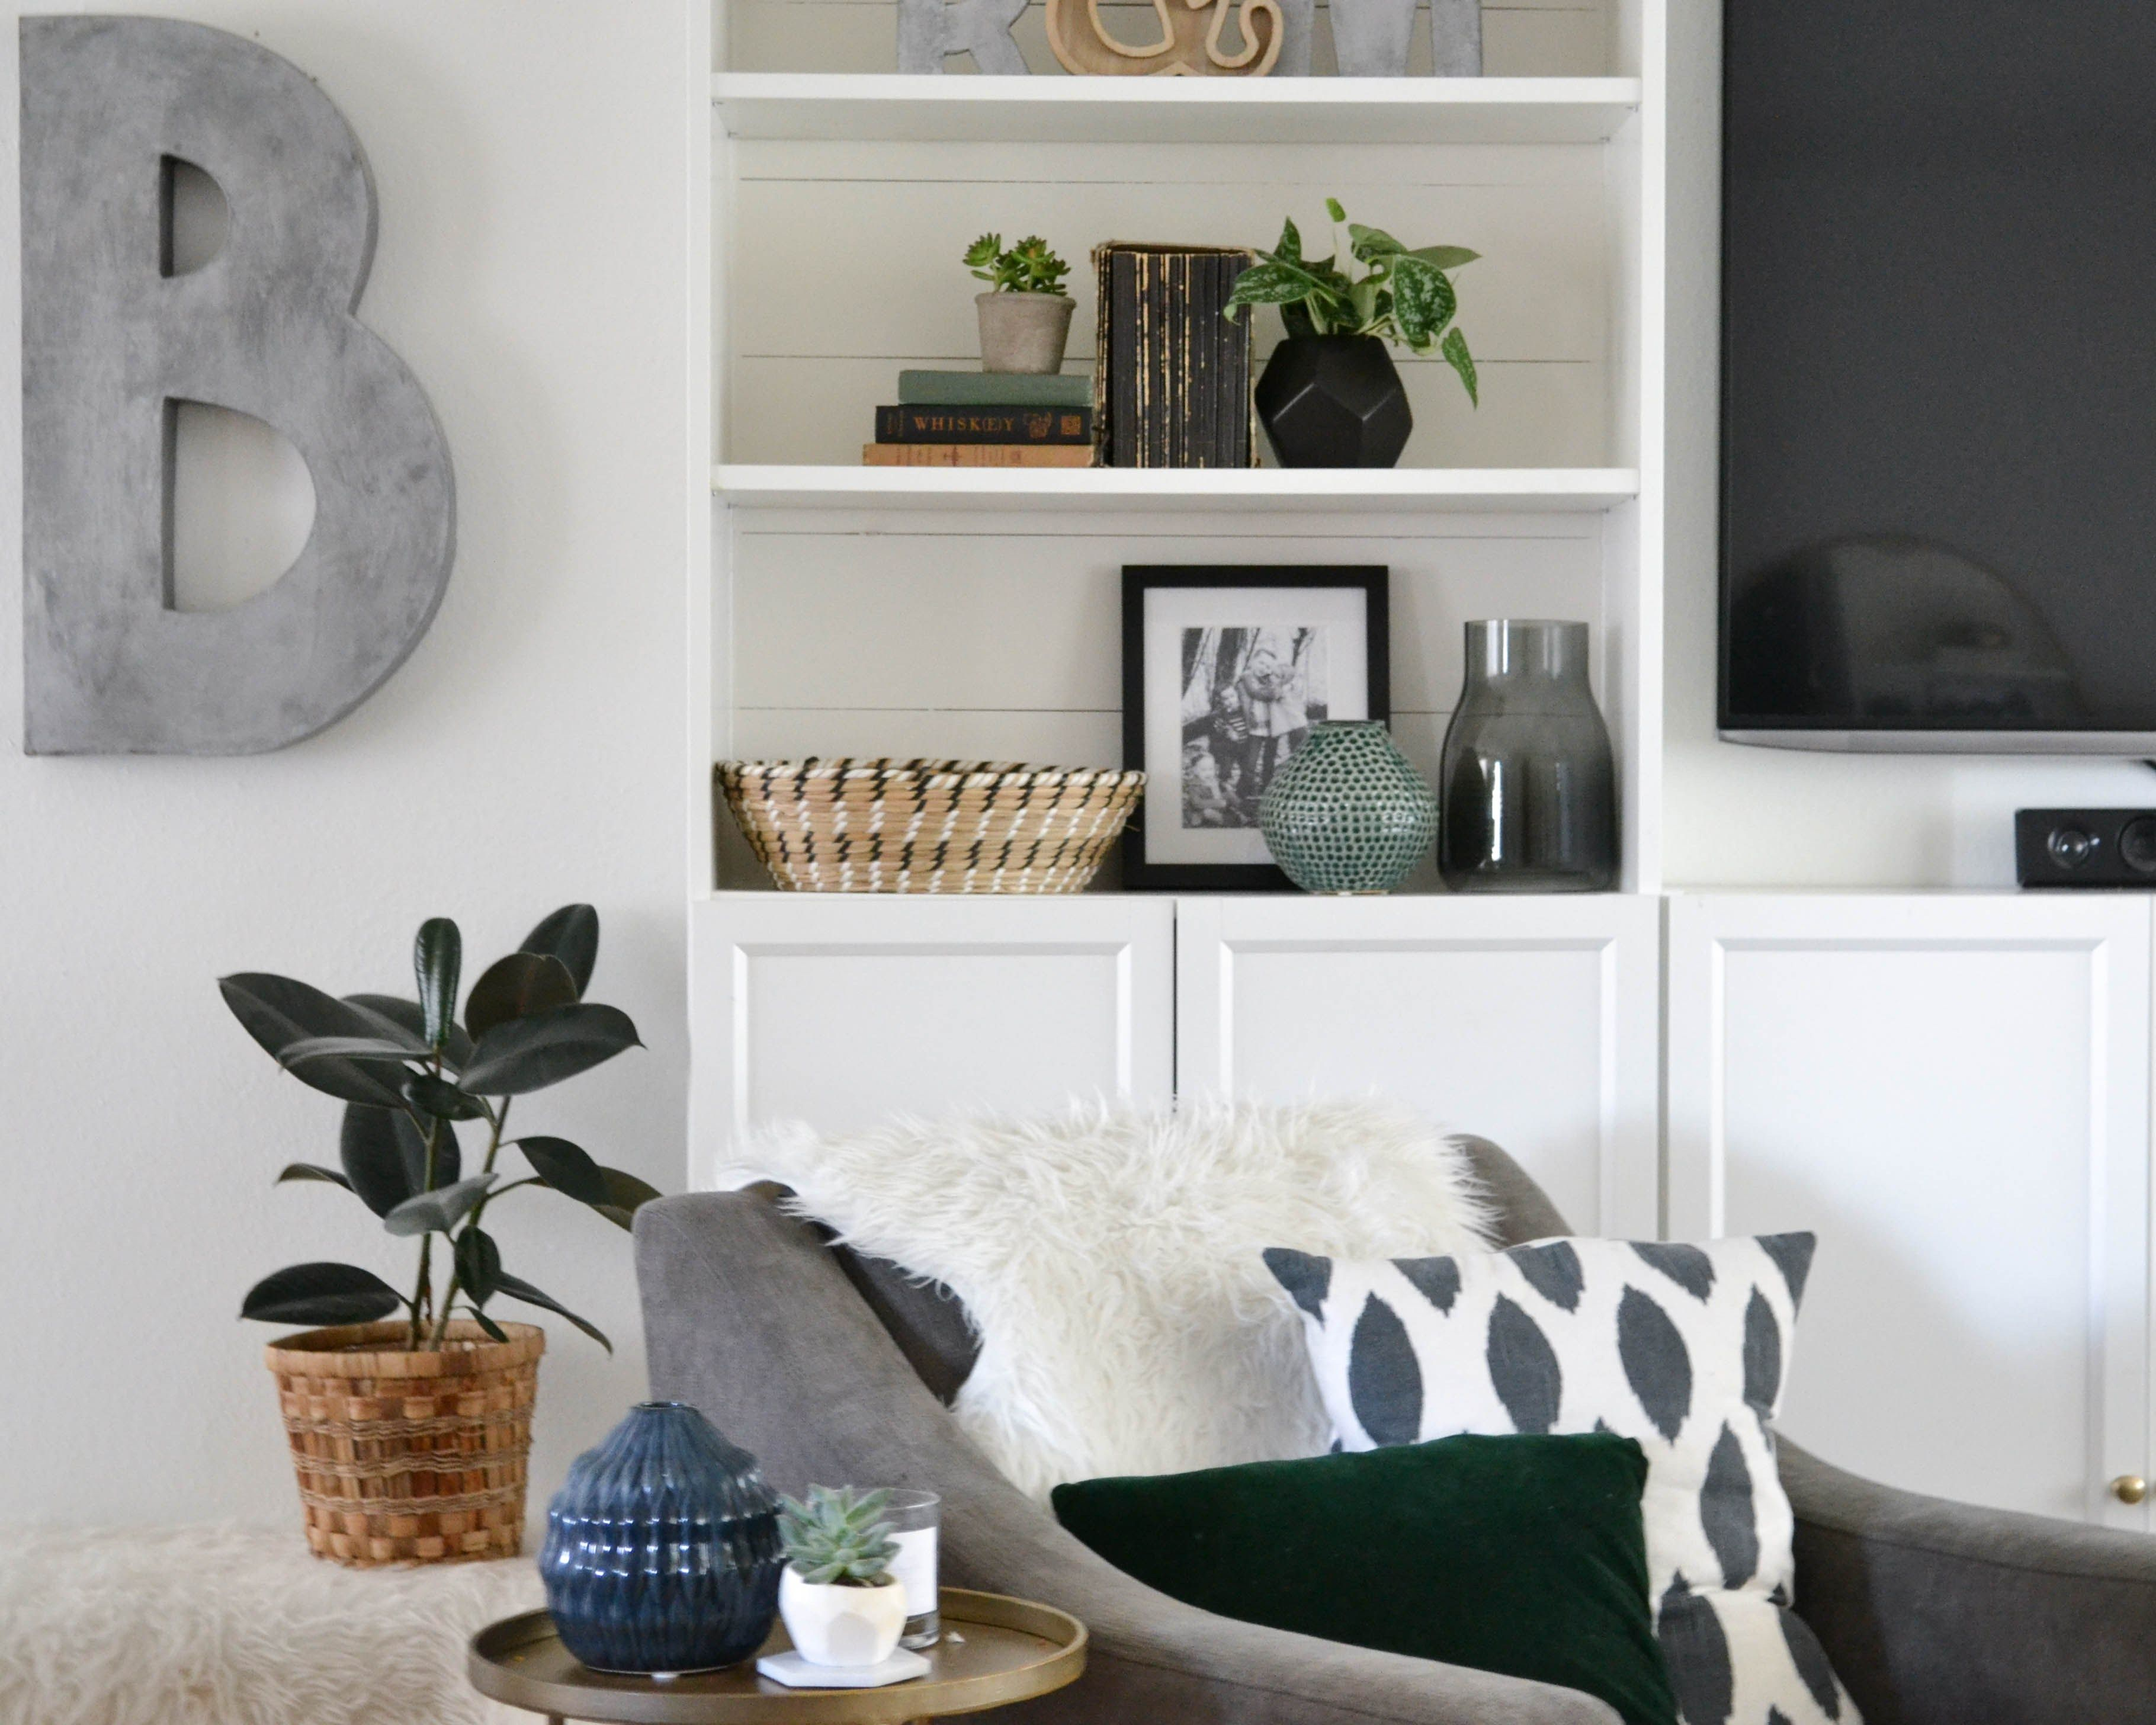 Diy Shiplap Shelves Grace Valiant Easily Add Shiplap To The Back Of A Bookcase Bookshelves Built In Diy Shiplap Bookcase Diy